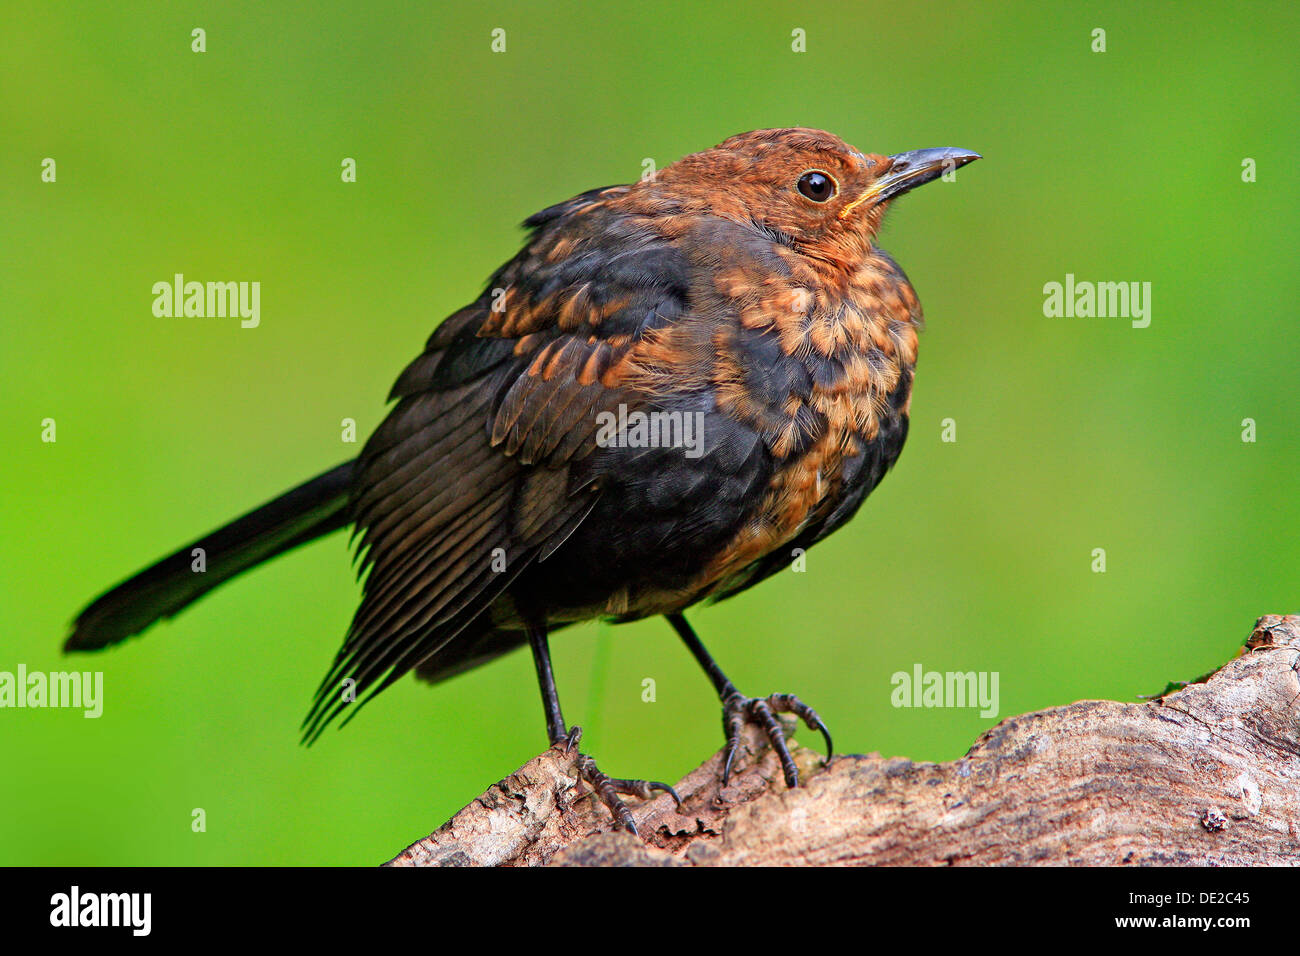 Blackbird (Turdus merula) - Stock Image